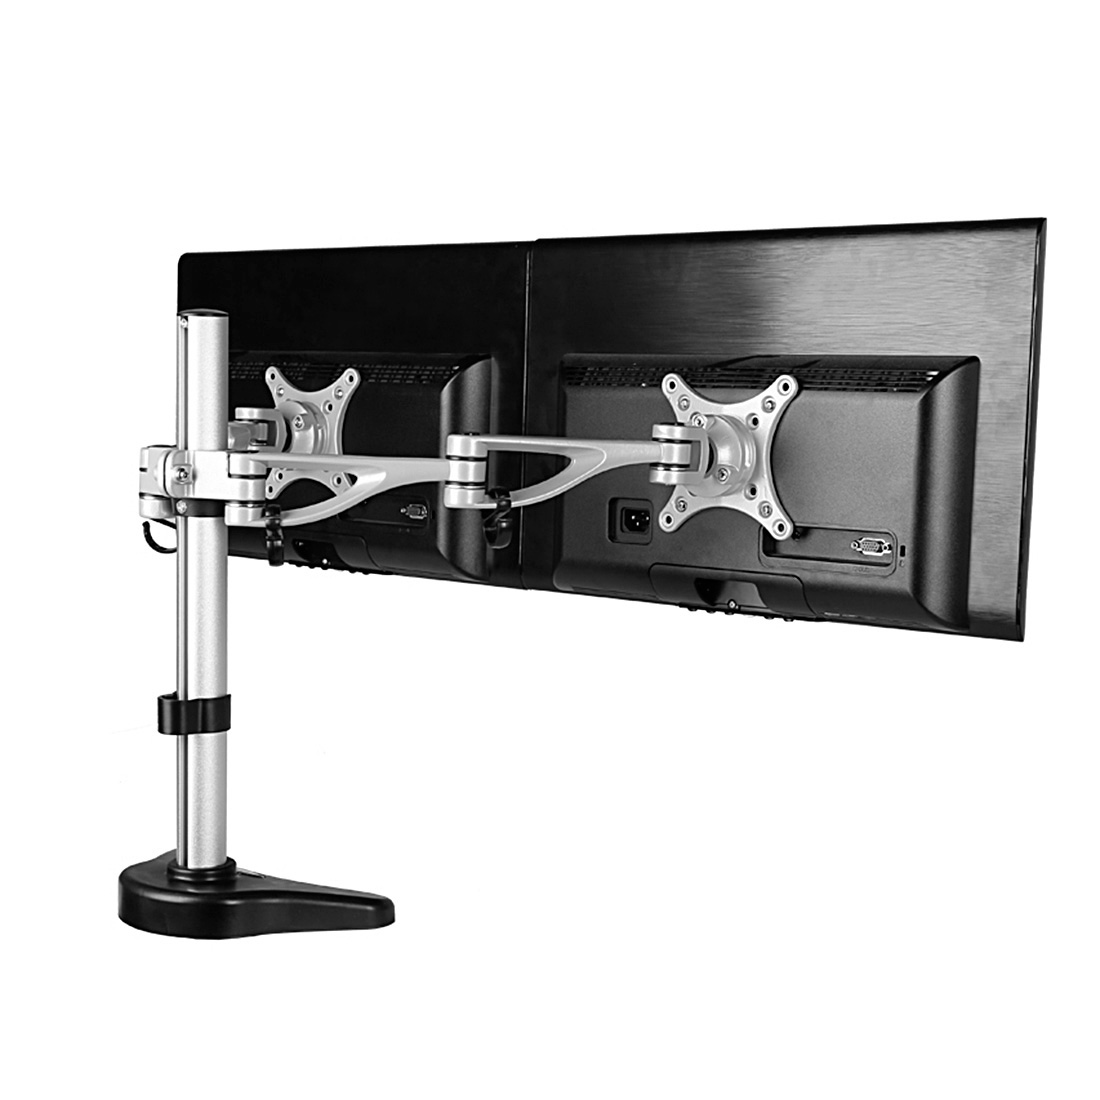 Fleximounts M13 Clamp Dual Monitor Arm Desk Mounts Monitor